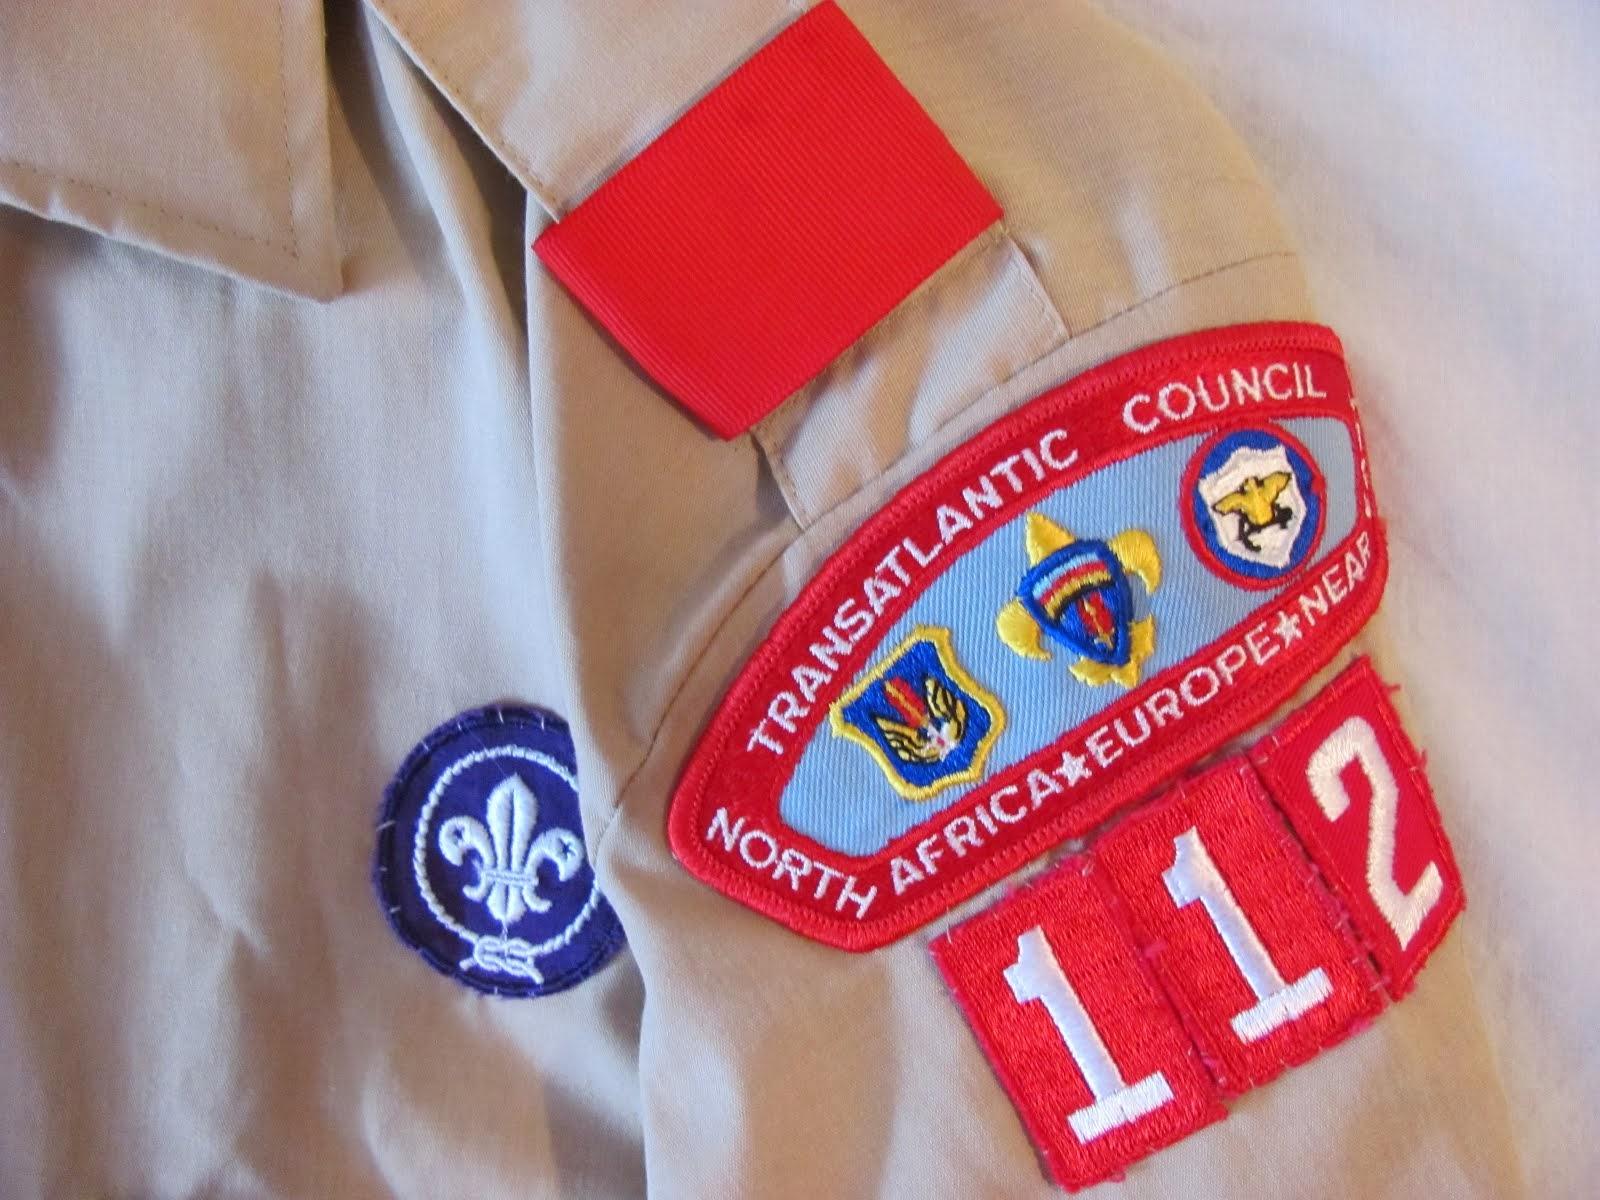 THOMAS Q KIMBALL WA8UNS BSA Transatlantic Council Troop 112